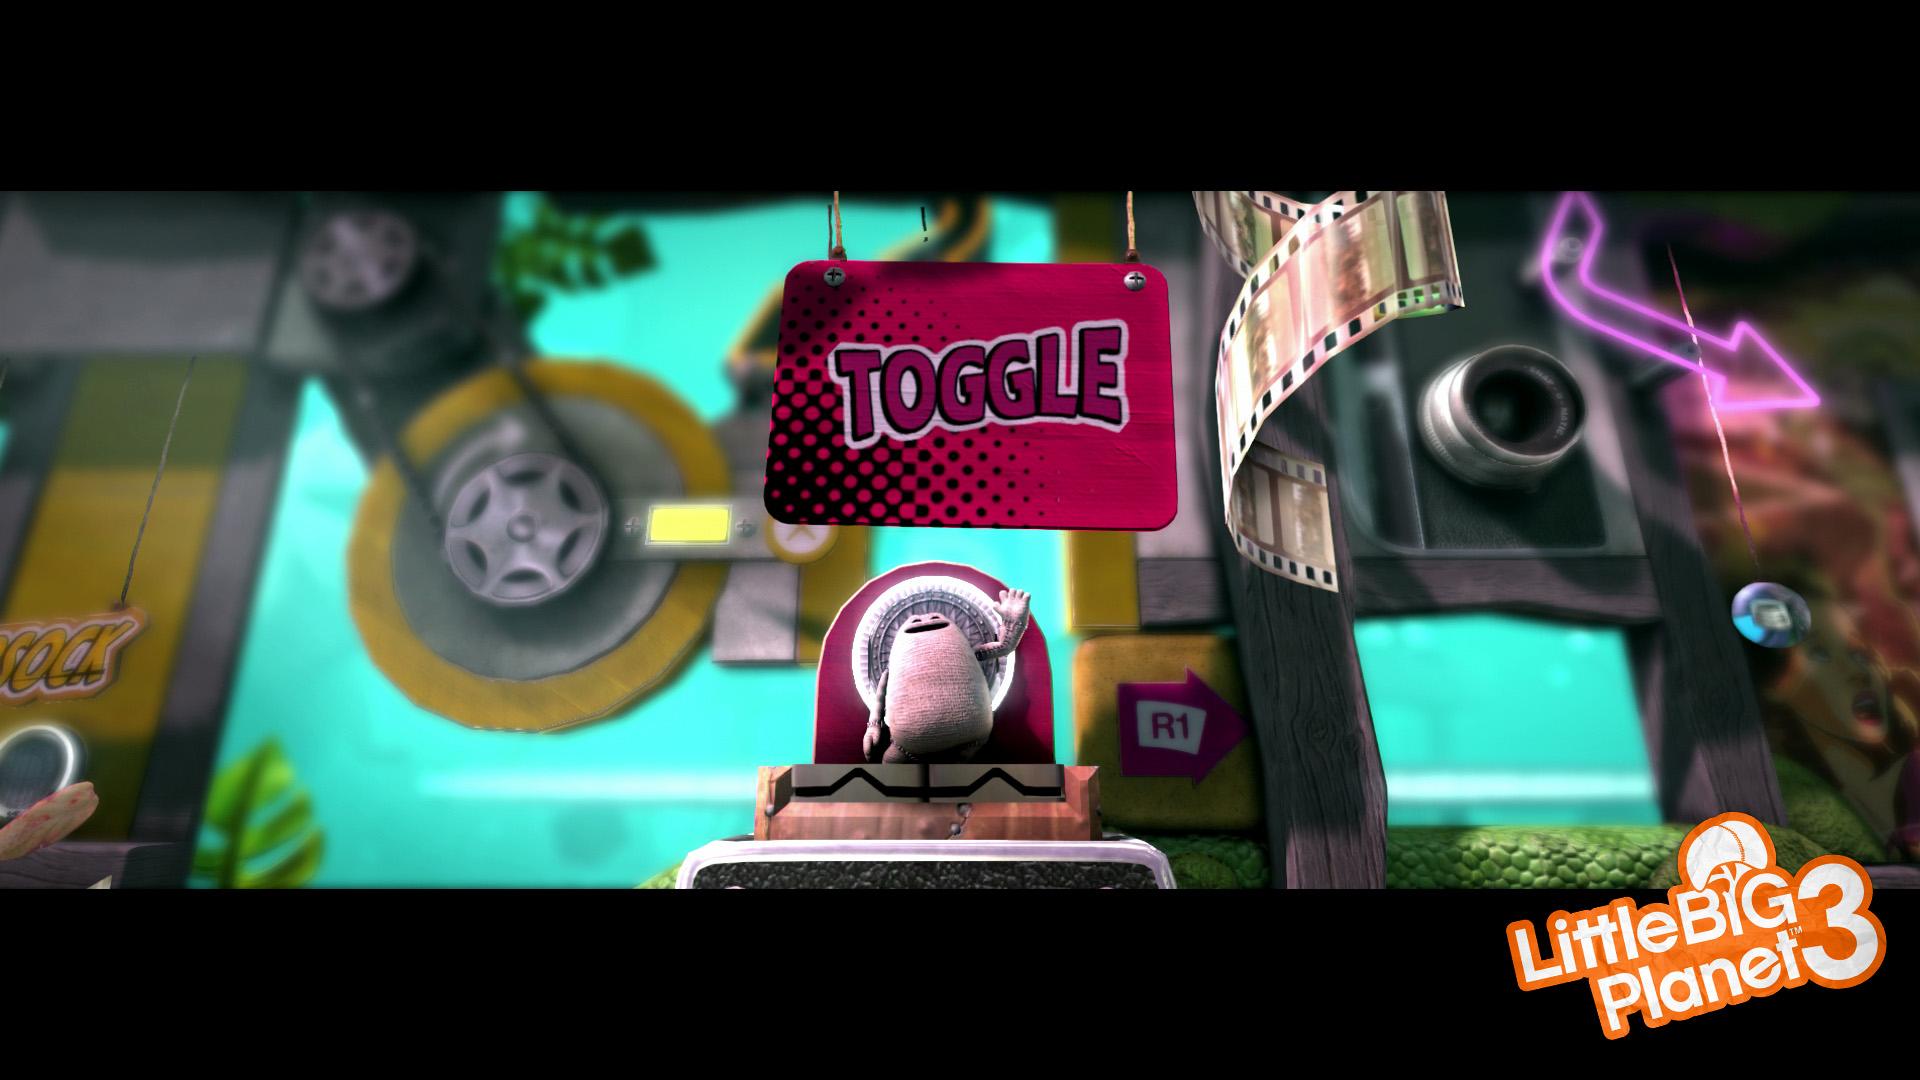 LittleBigPlanet3 PS4 Editeur 013